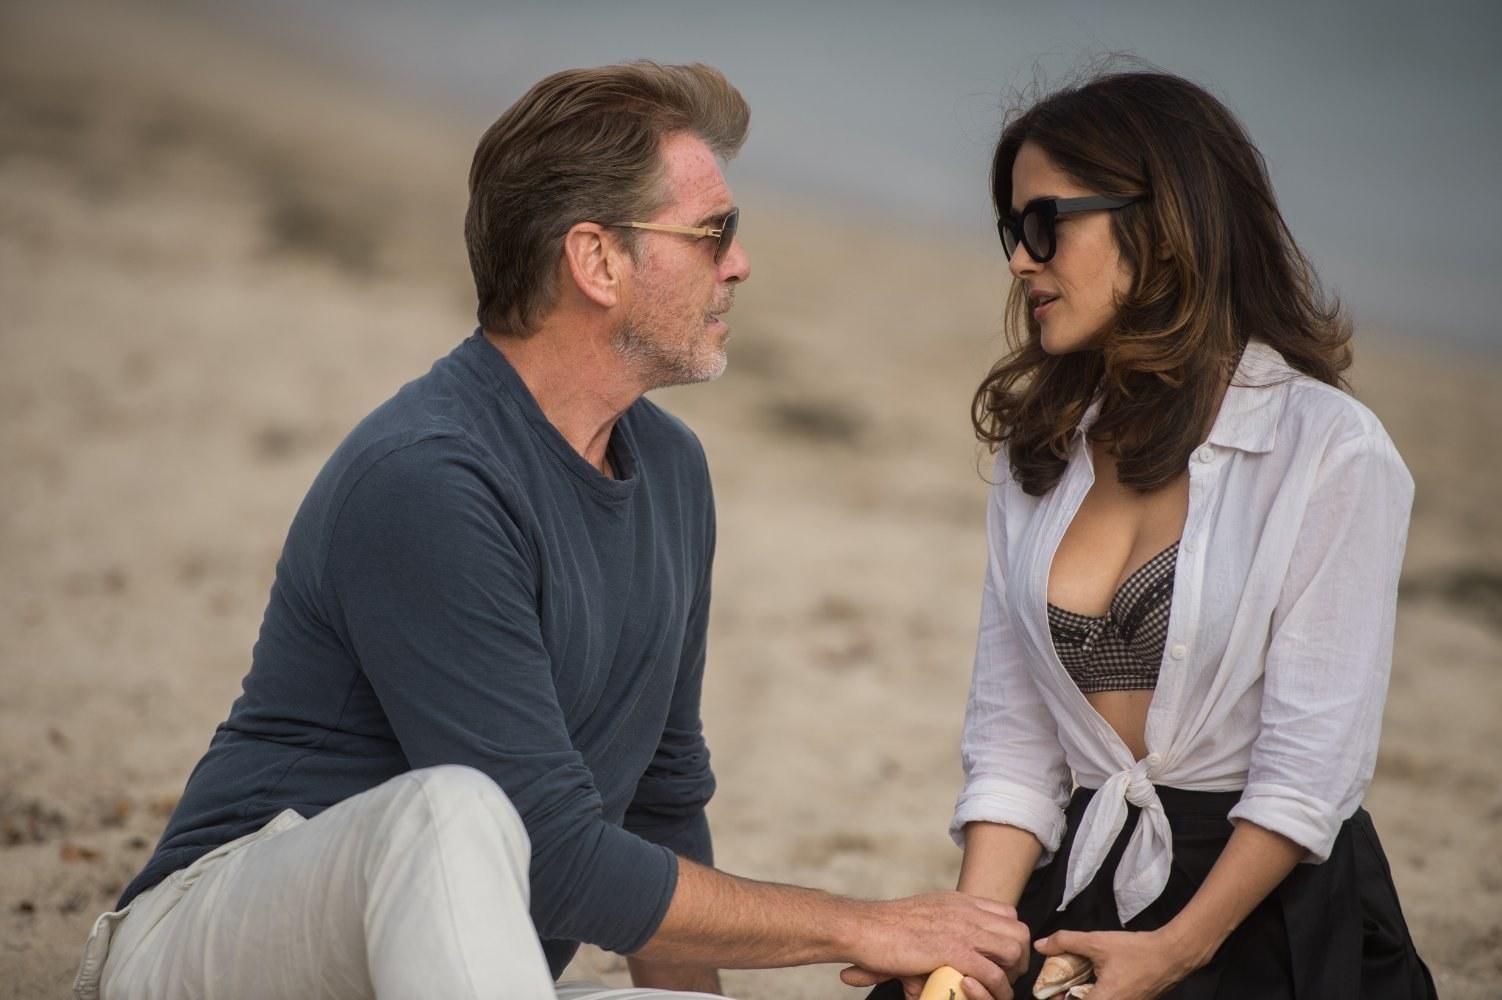 Pierce Brosnan and Salma Hayek talk on the beach in Some Kind of Beautiful